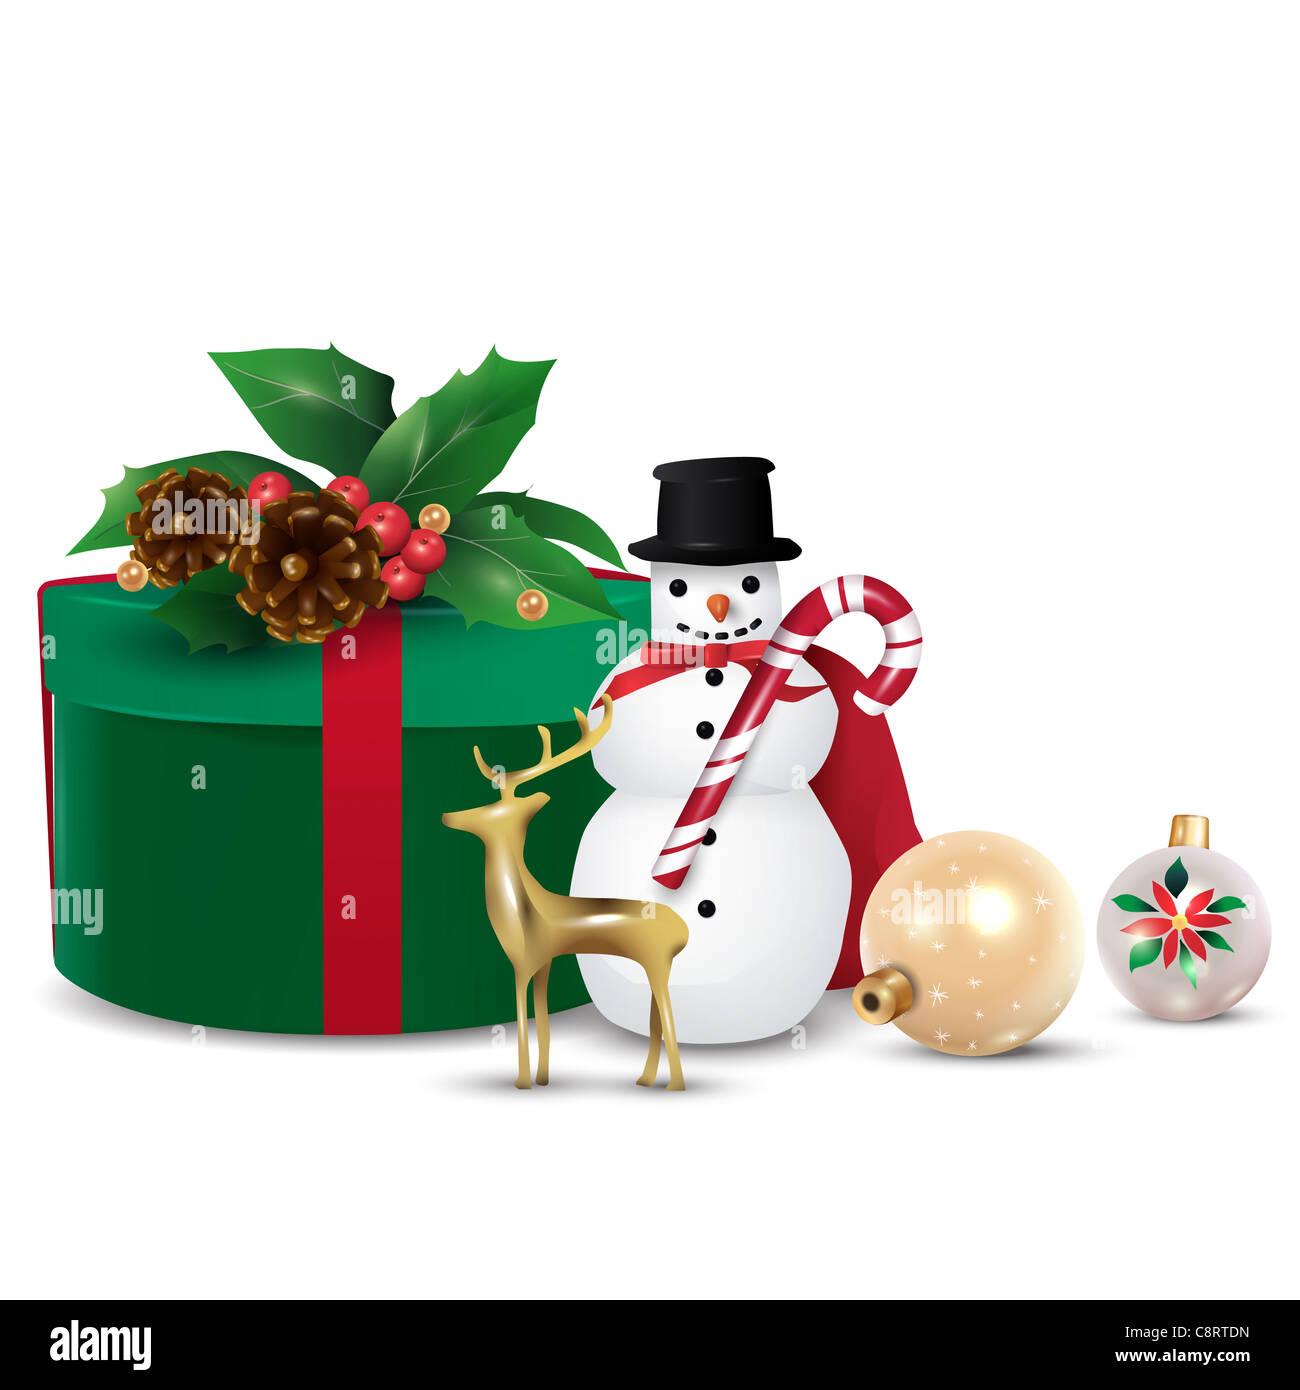 Christmas Gifts And Christmas Ornaments - Stock Image